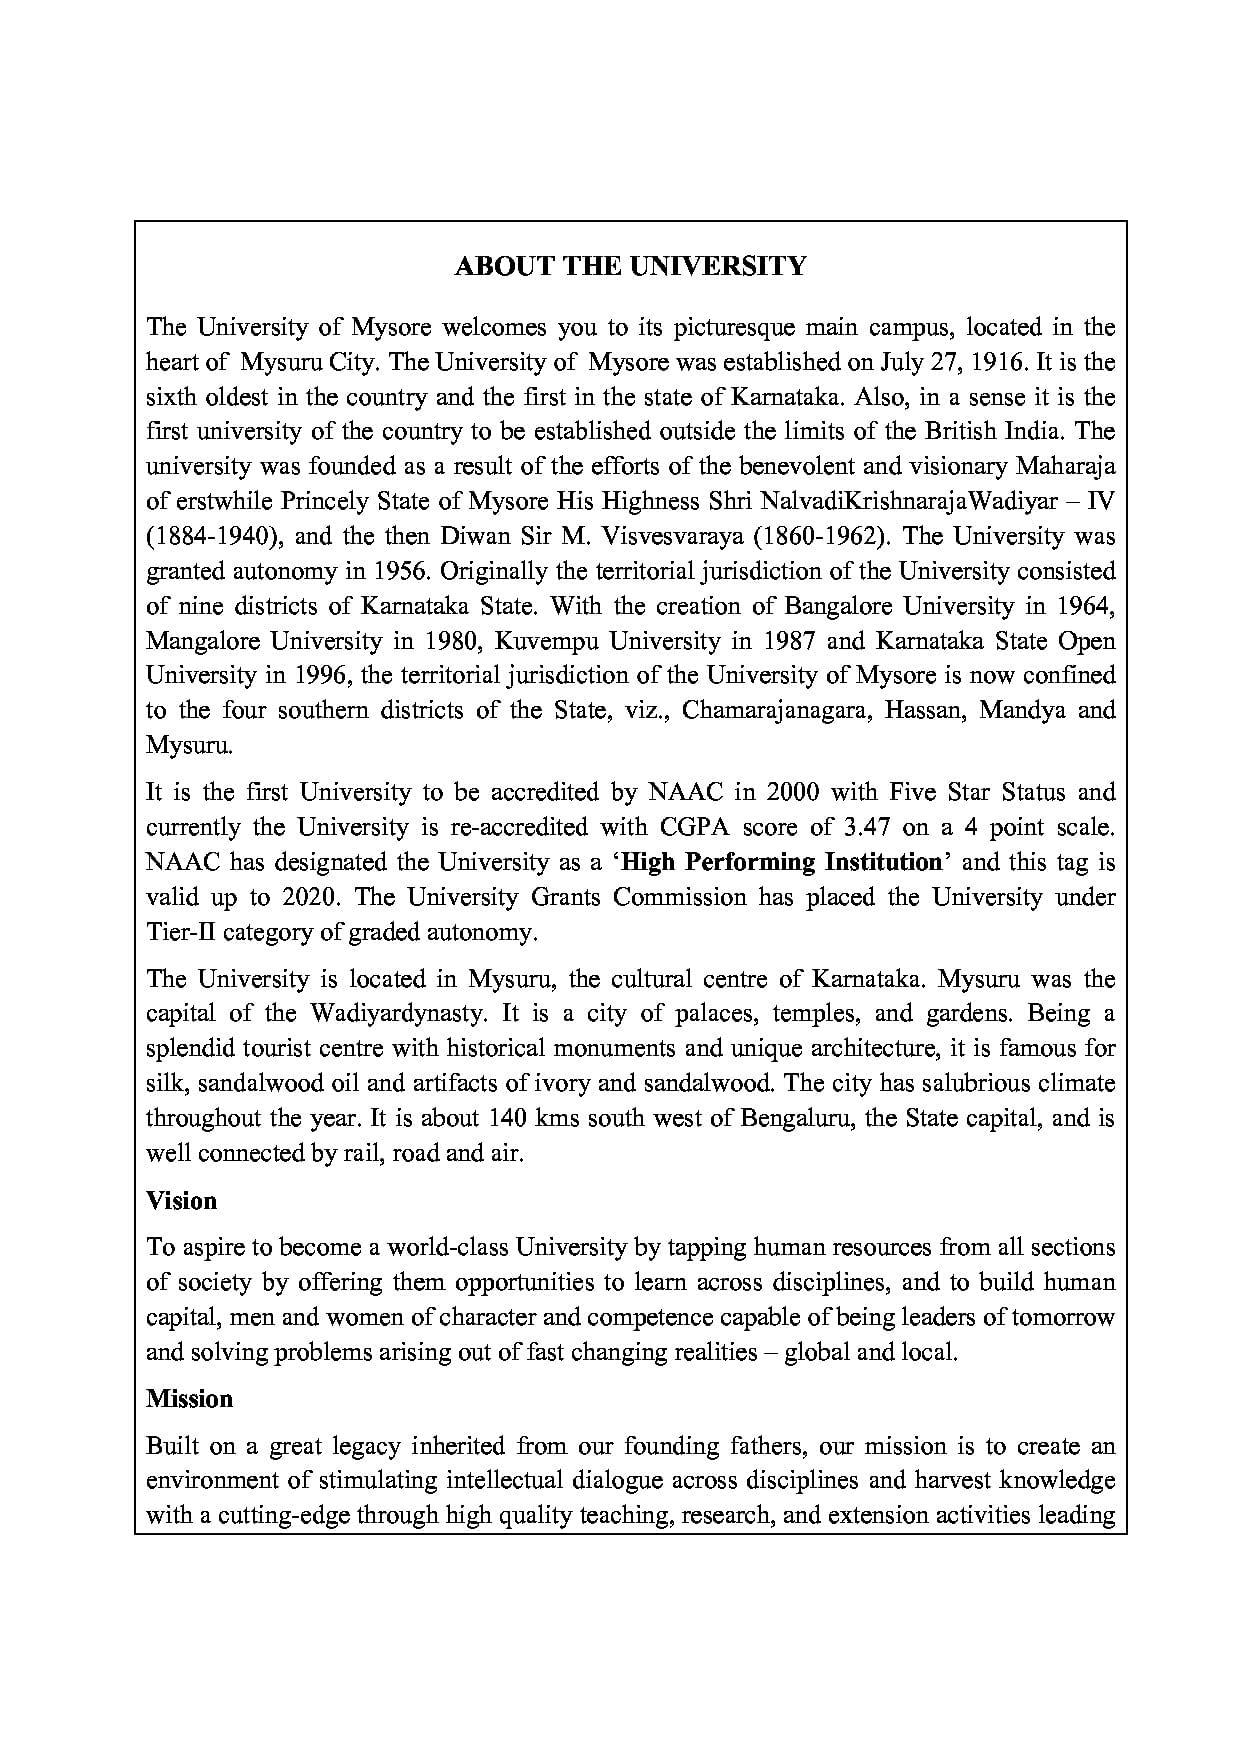 Mysore University - UOM (University of Mysore) - Admissions